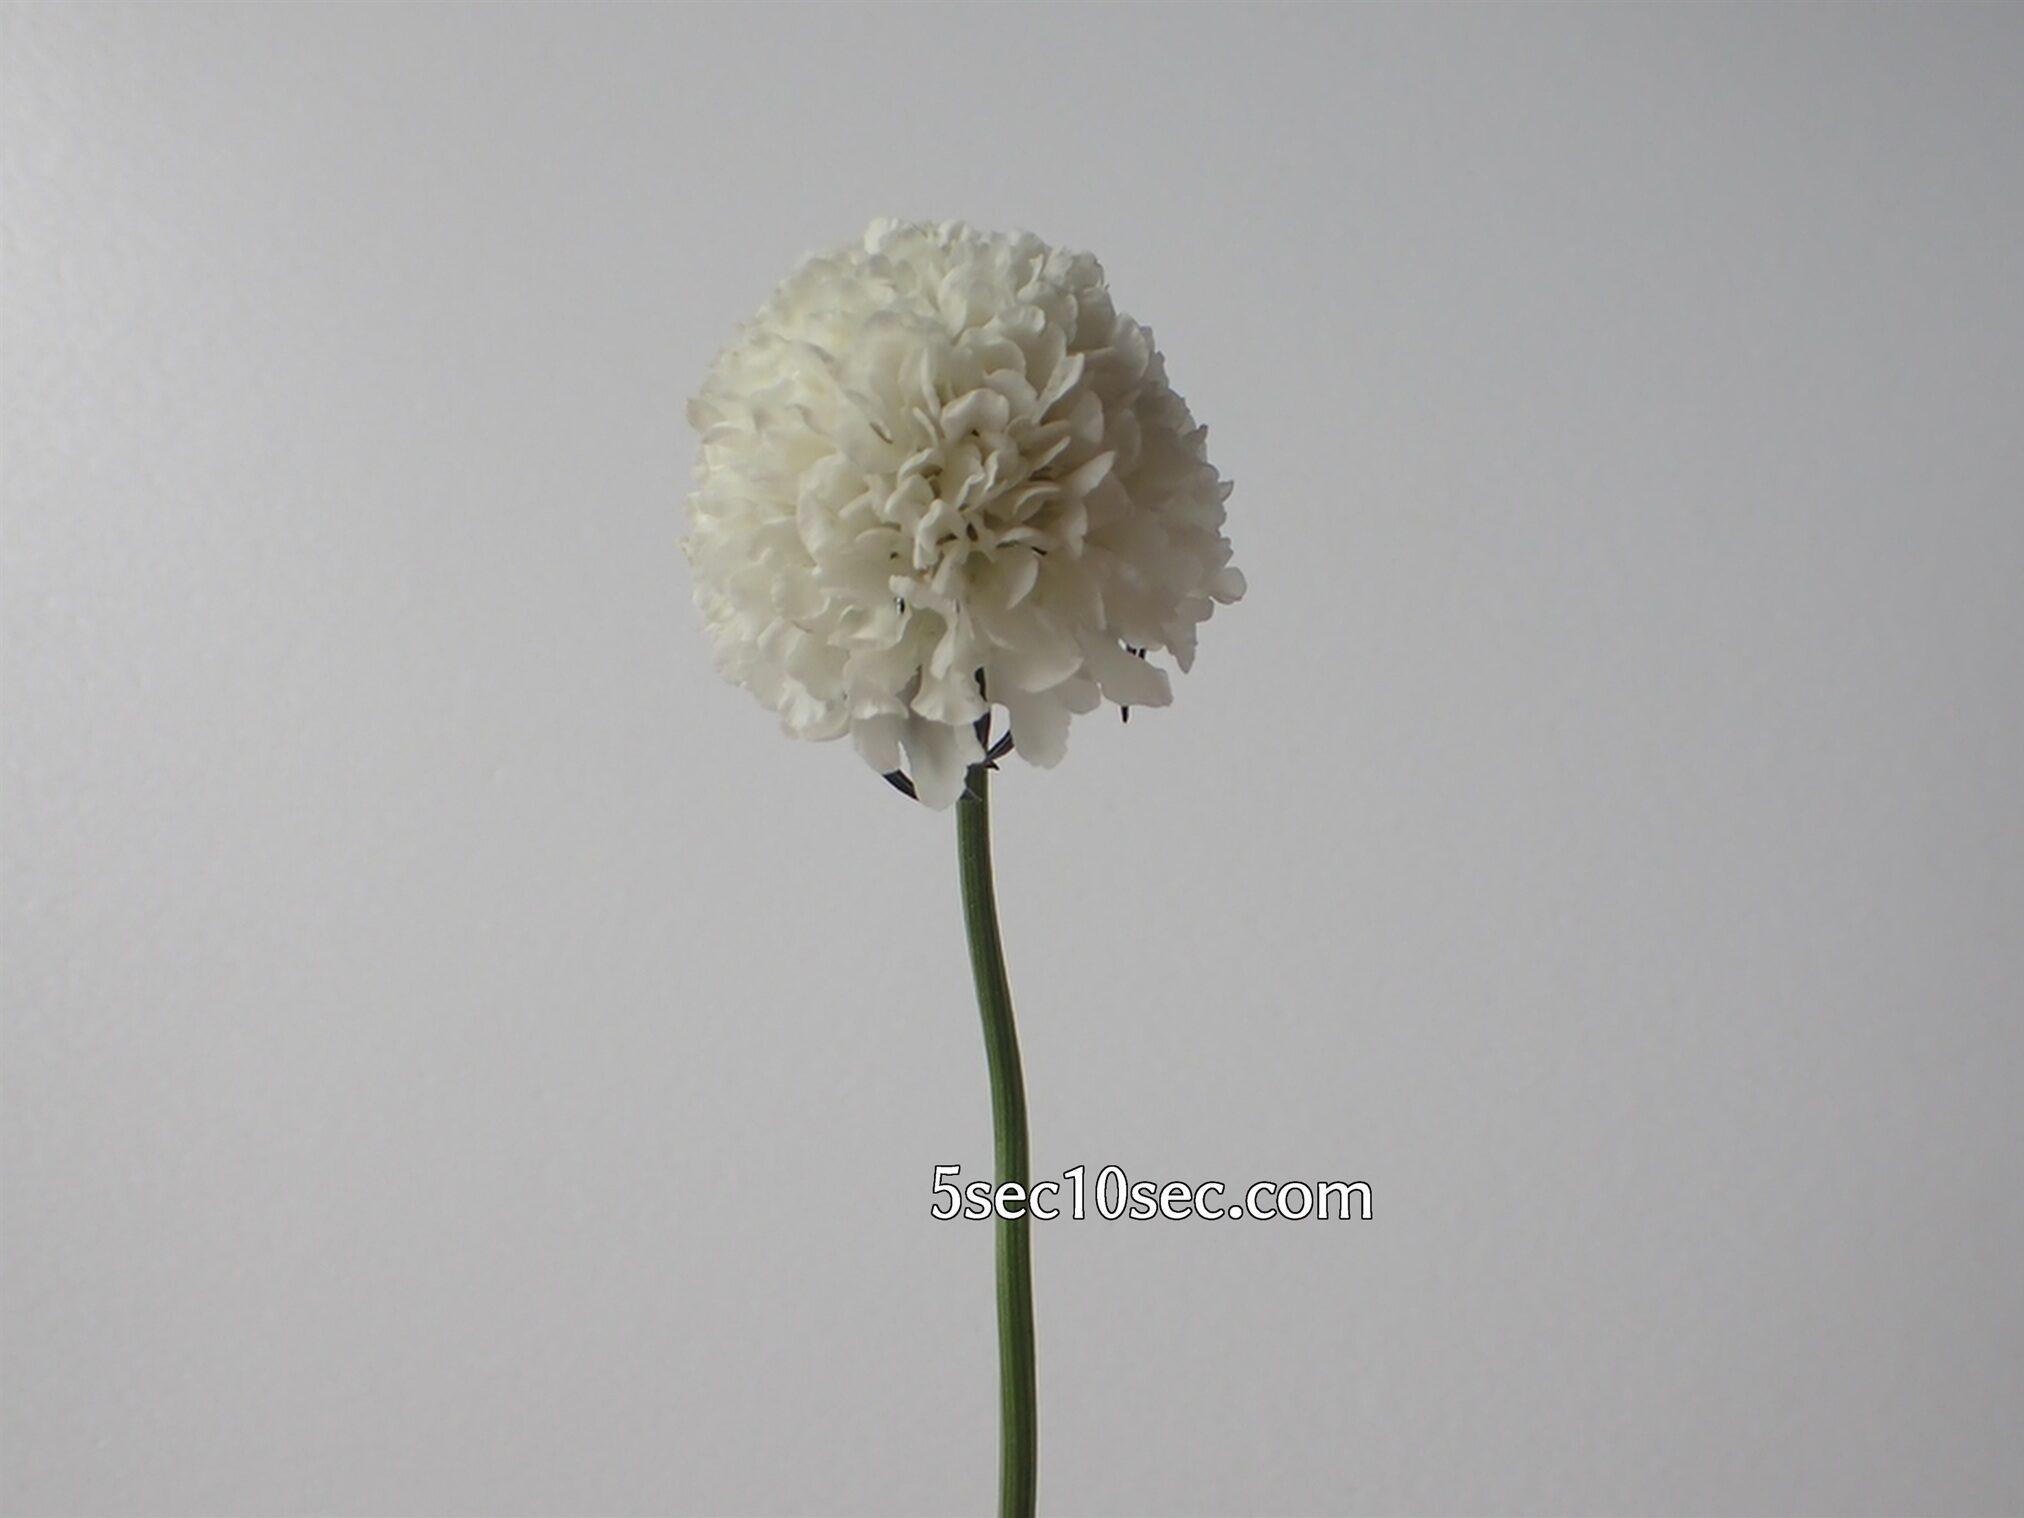 Bloomee LIFE(ブルーミーライフ)レギュラープラン 2021年1月下旬 今週のお花 スカビオサ